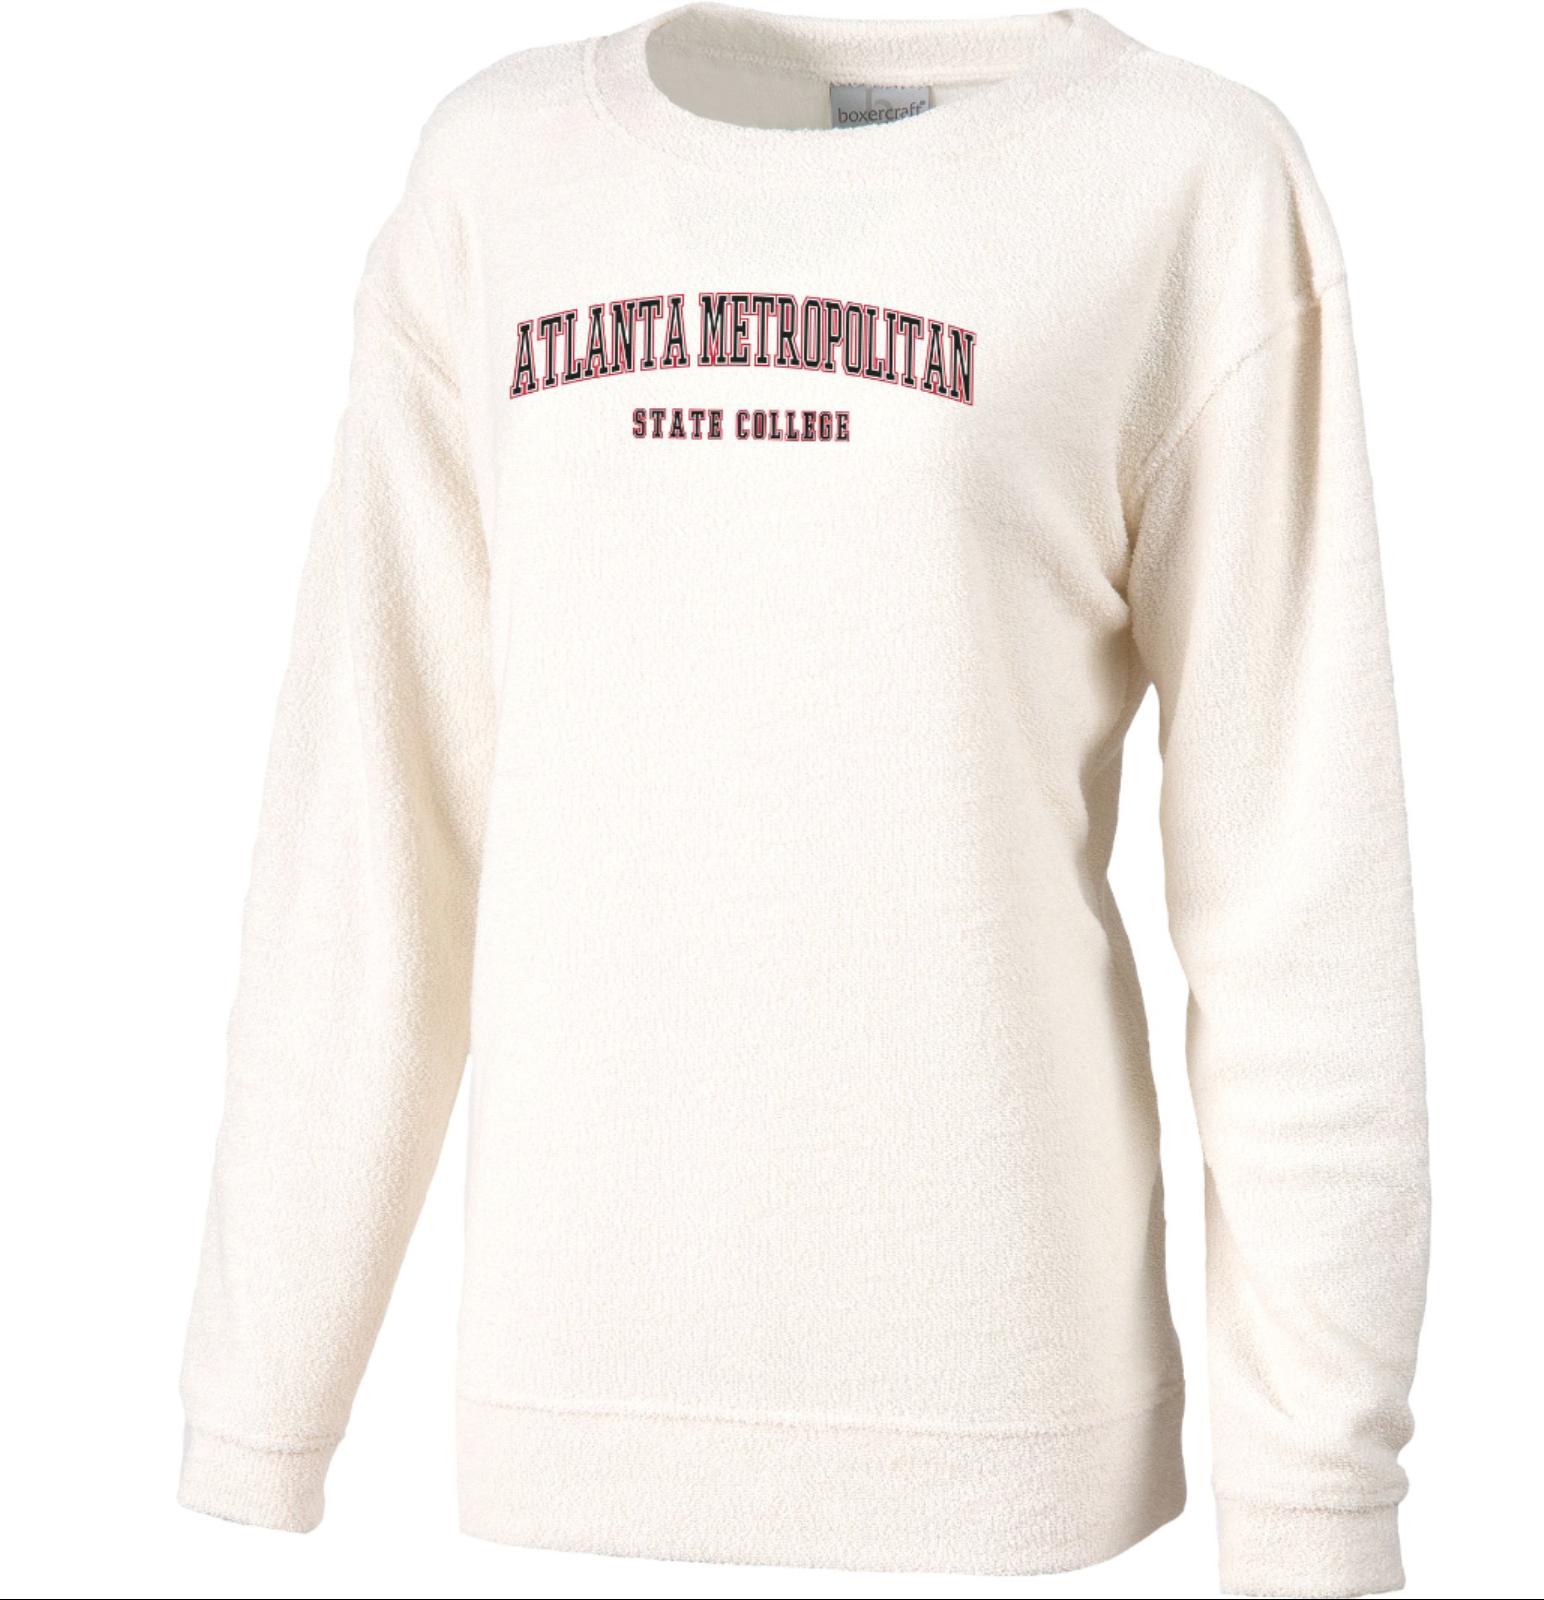 Atlanta Metropolitan State College Women's Slim Fit Cozy Crew Neck Sweatshirt